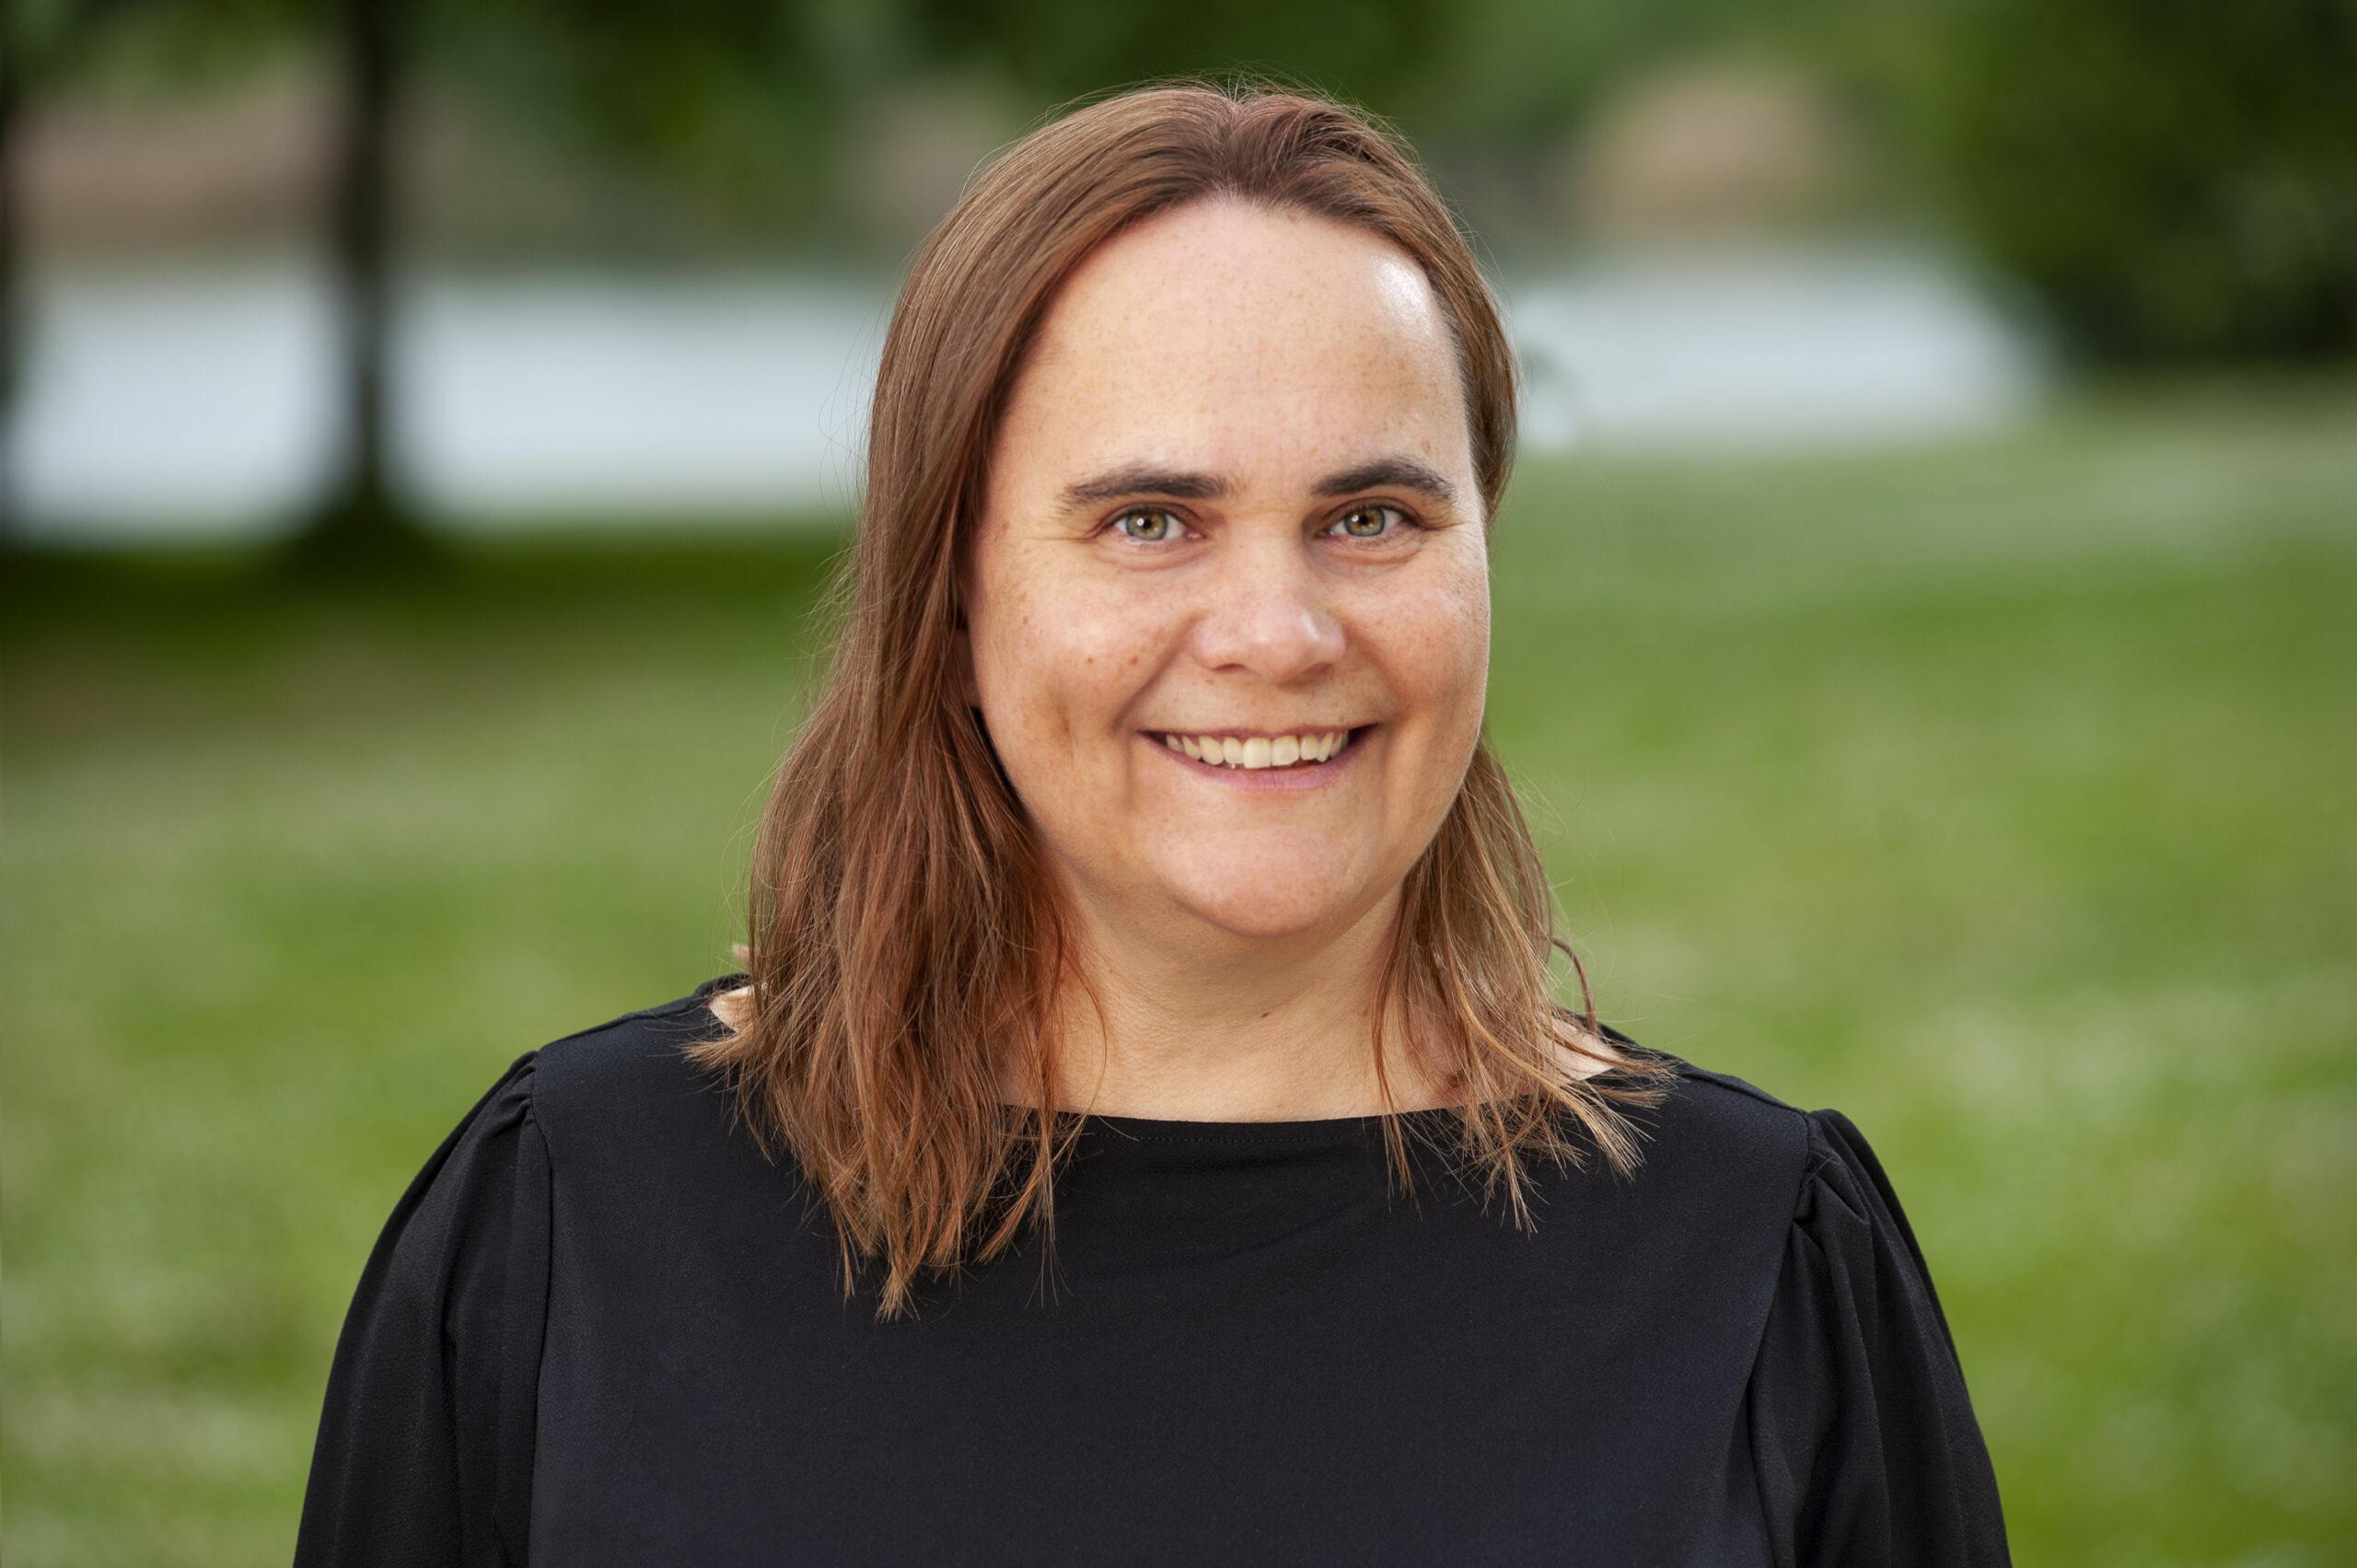 Diana Casel